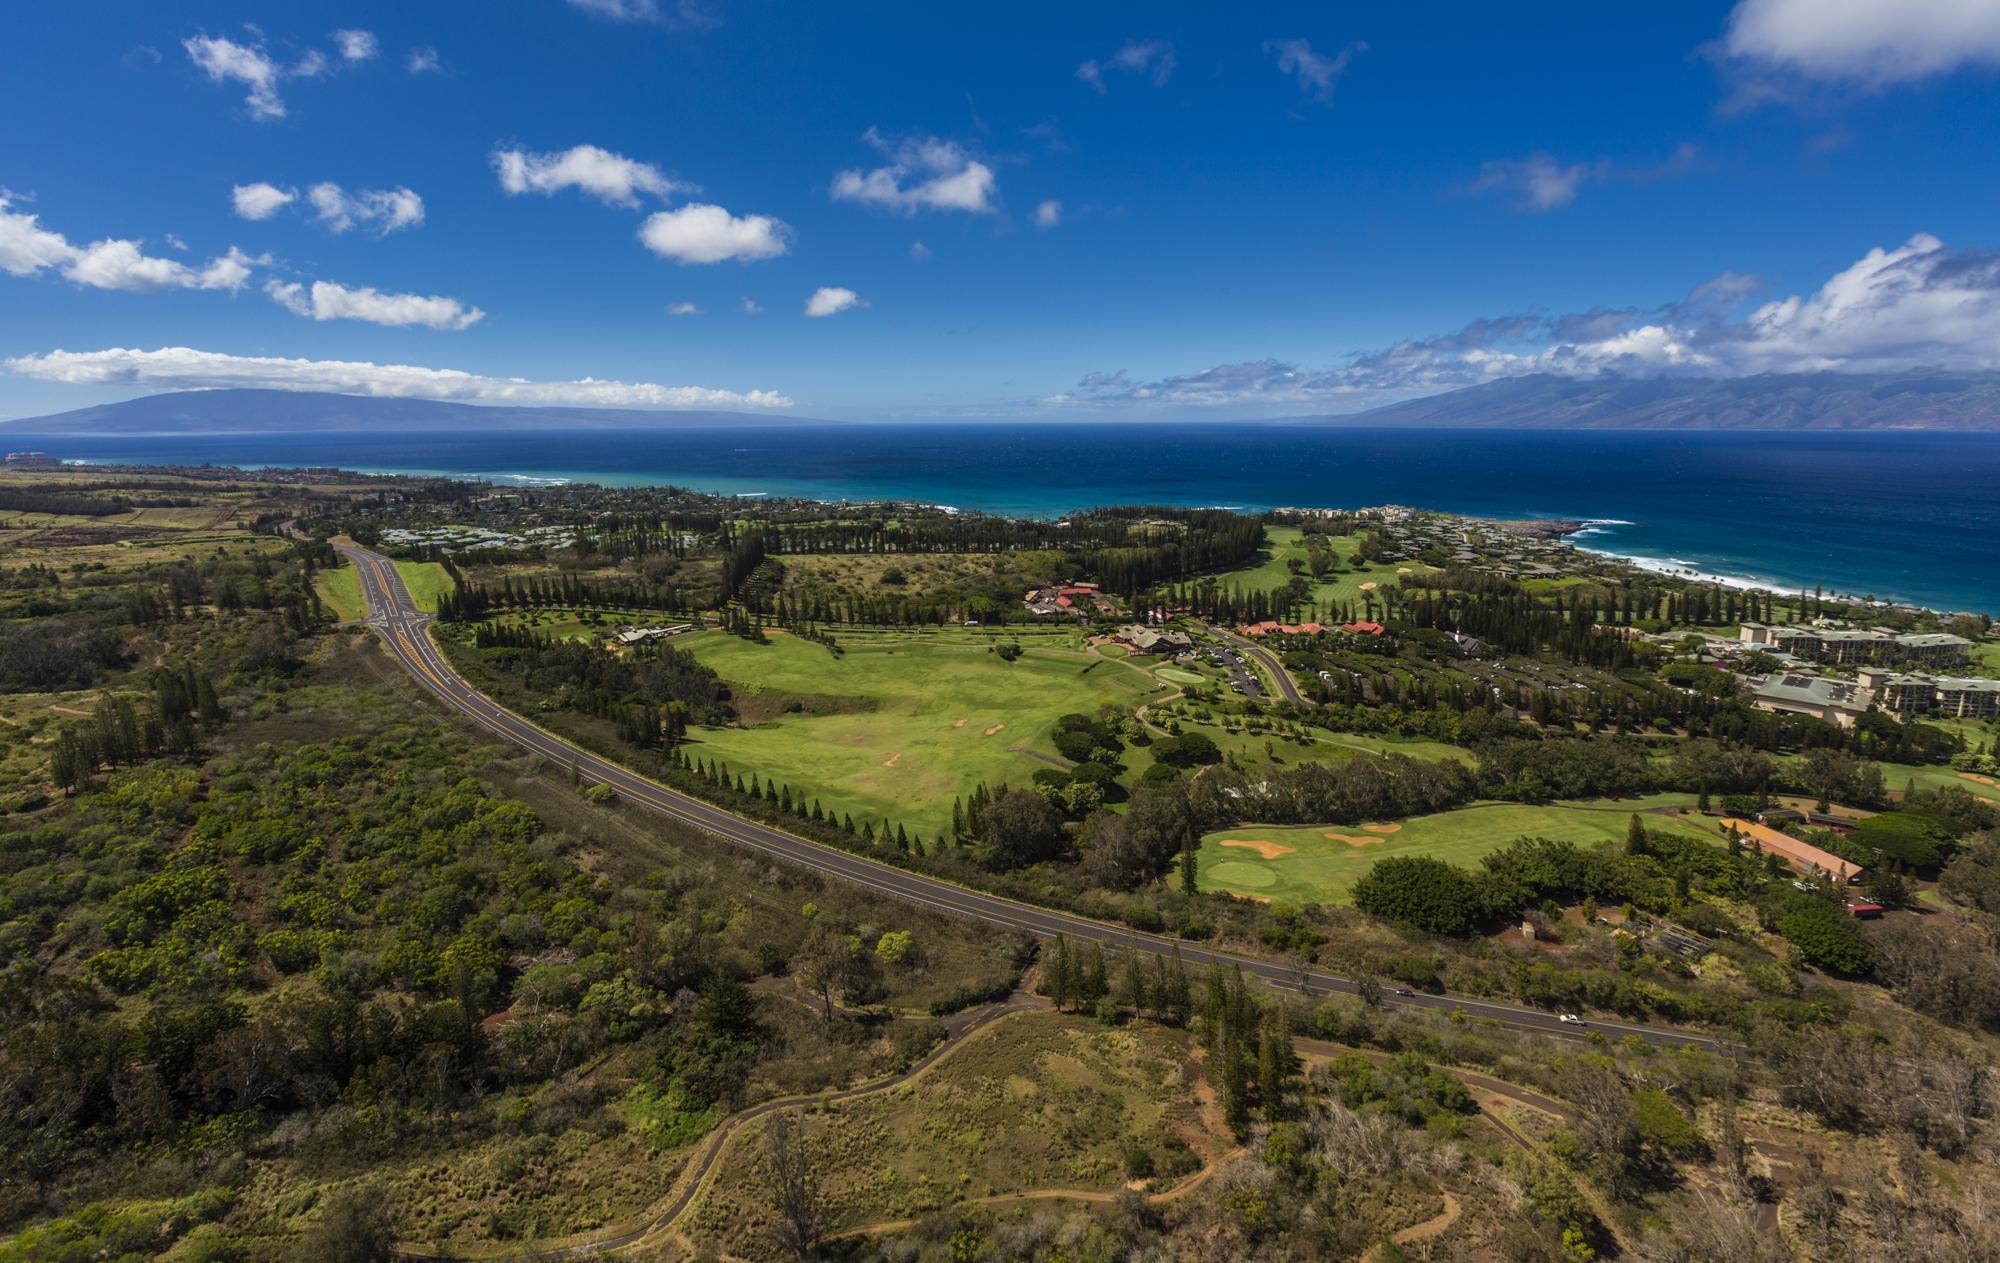 Photo: Hawaii Tourism Authority (HTA) / Tor Johnson